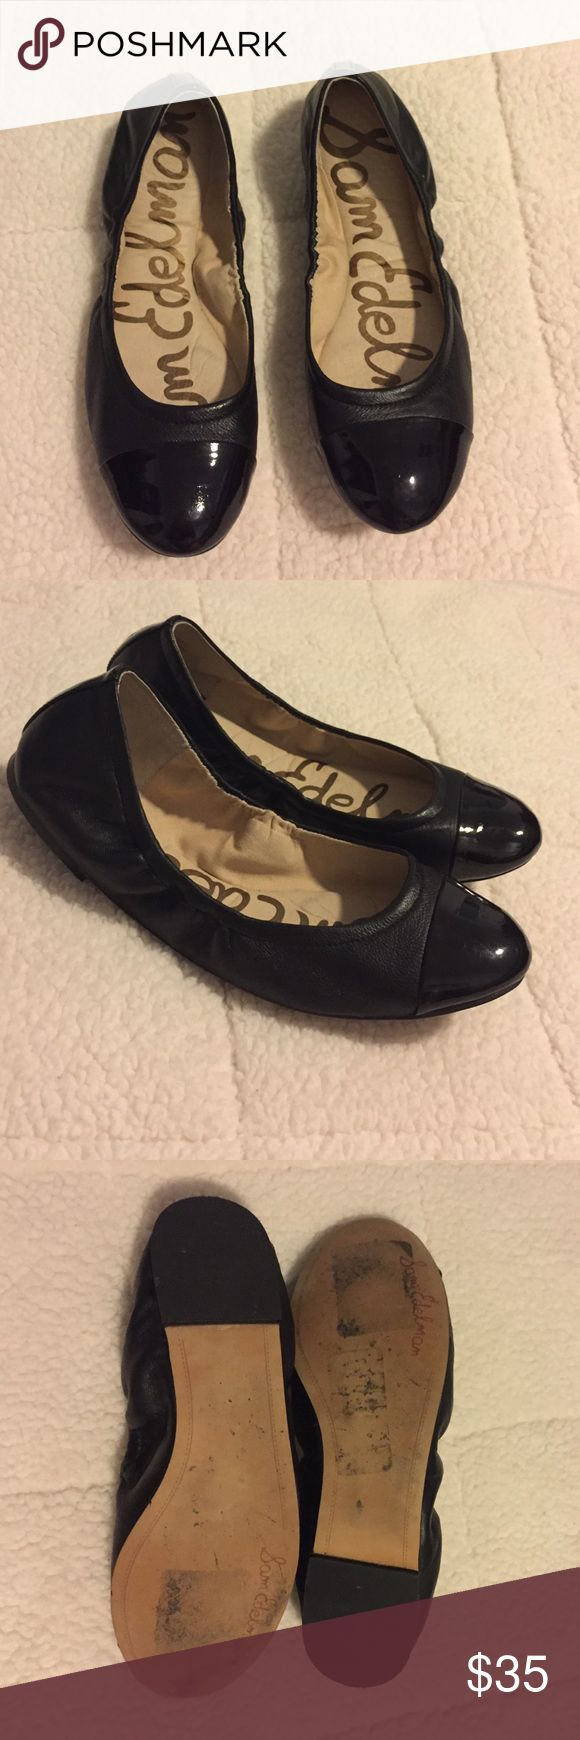 Black patent leather sam edelman flat Very good condition. Black leather. Sam Edelman Shoes Flats & Loafers